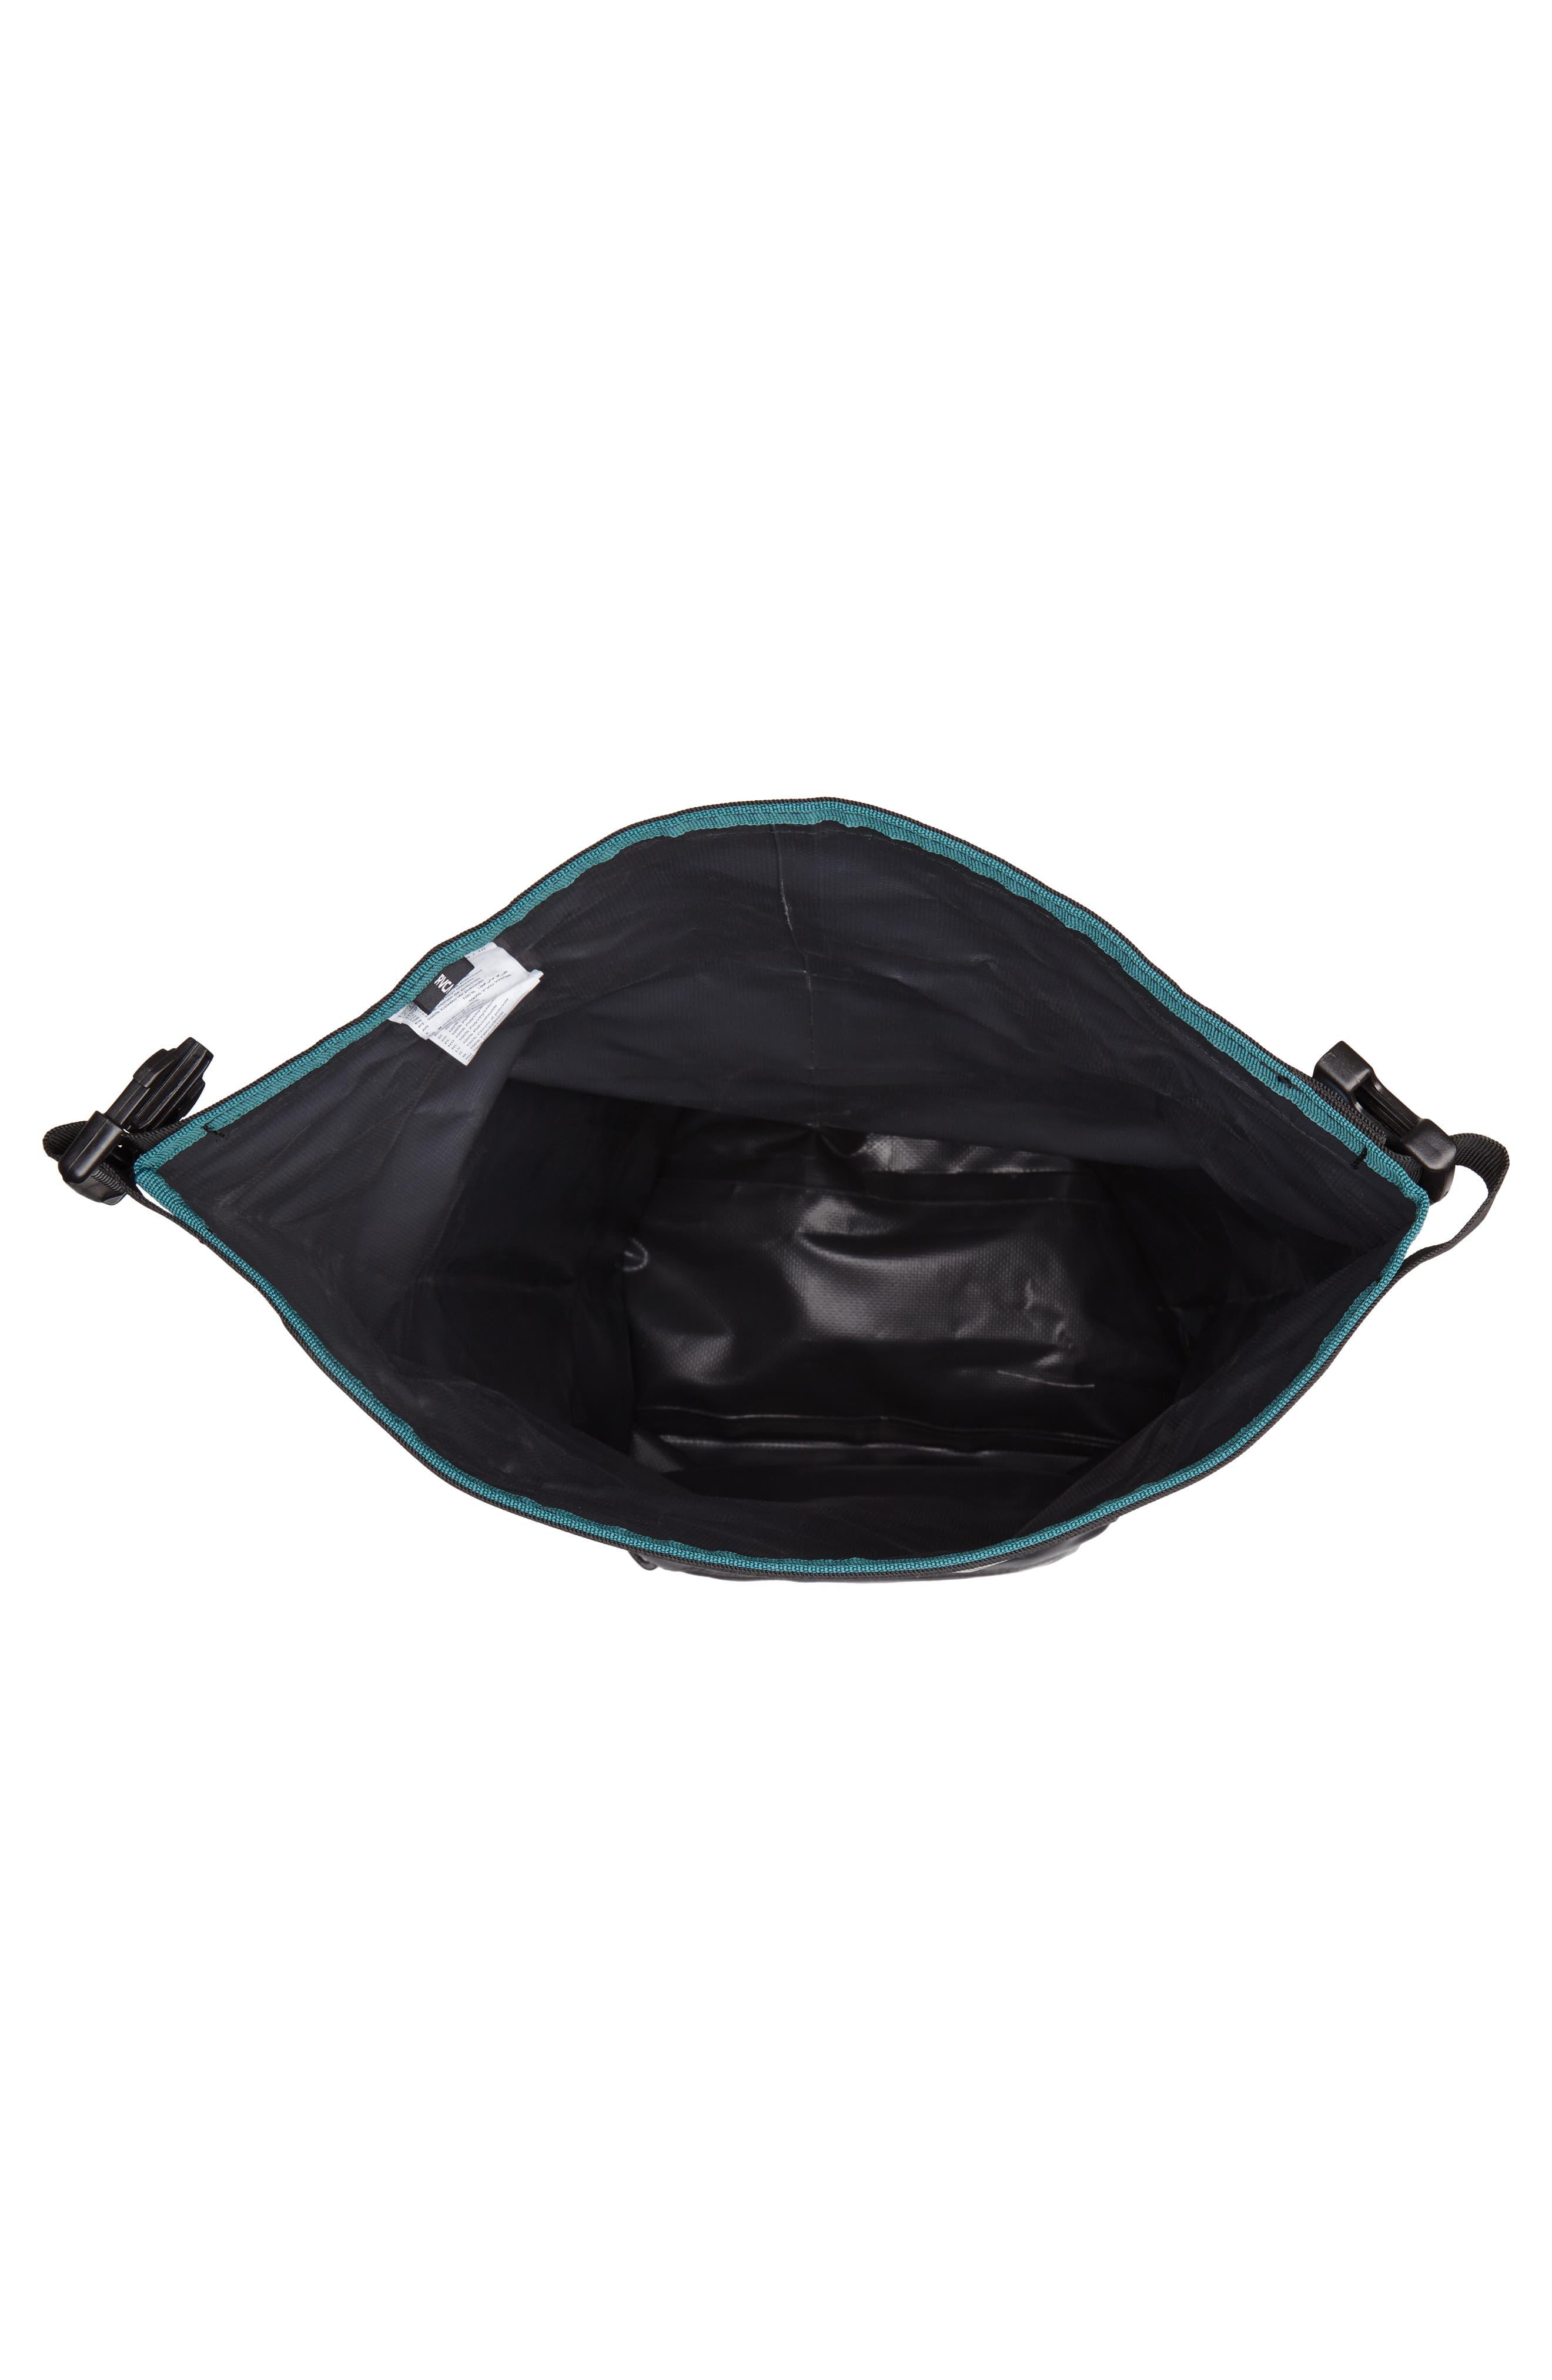 Go Be II Waterproof Backpack,                             Alternate thumbnail 4, color,                             Charcoal